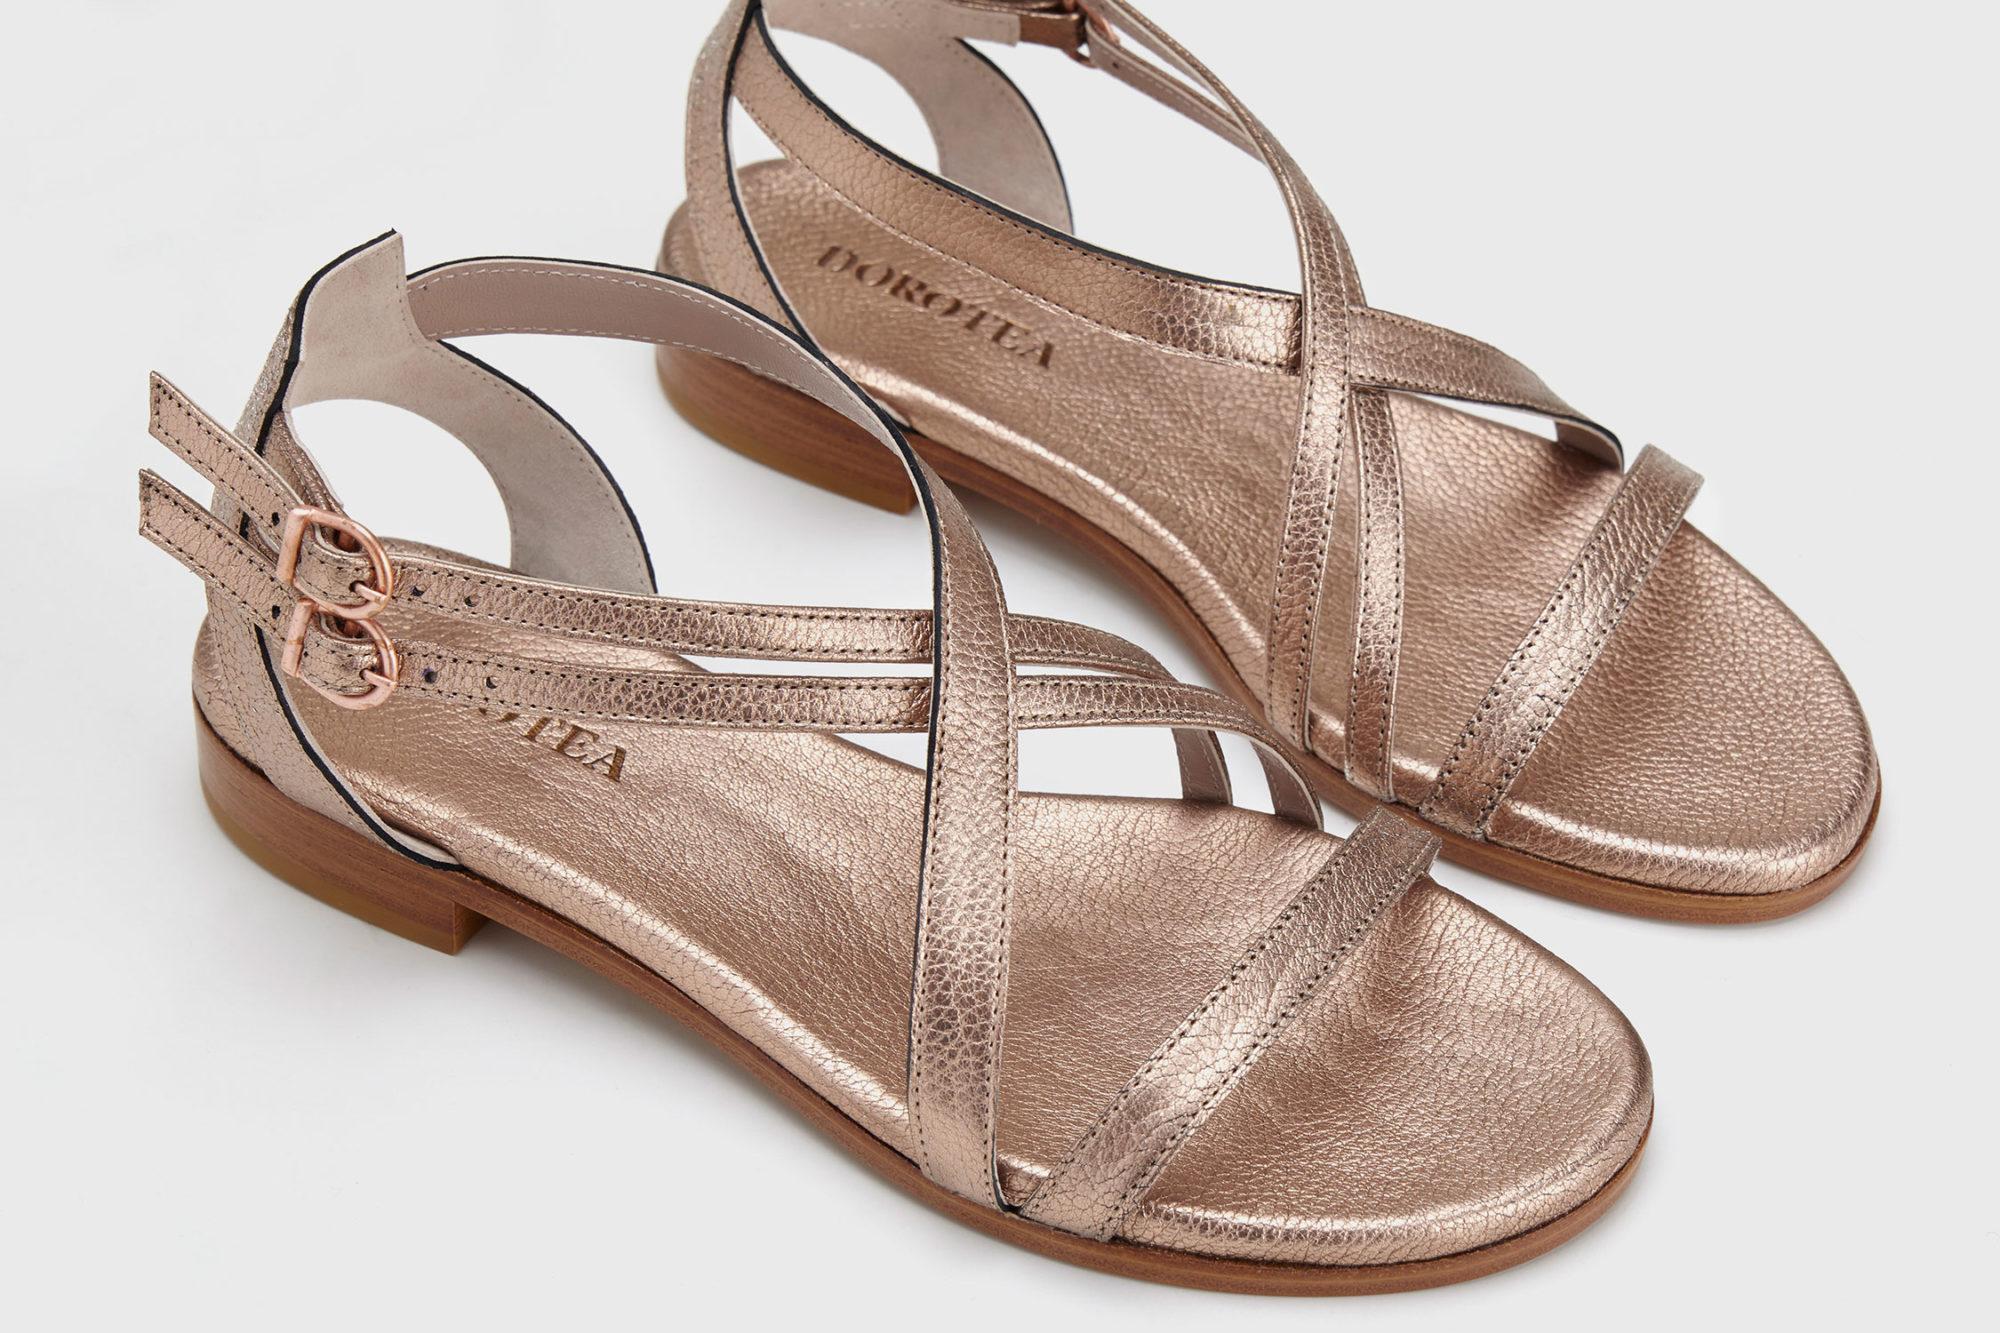 Dorotea sandalia plana charlotte muse canela ss17 detalle